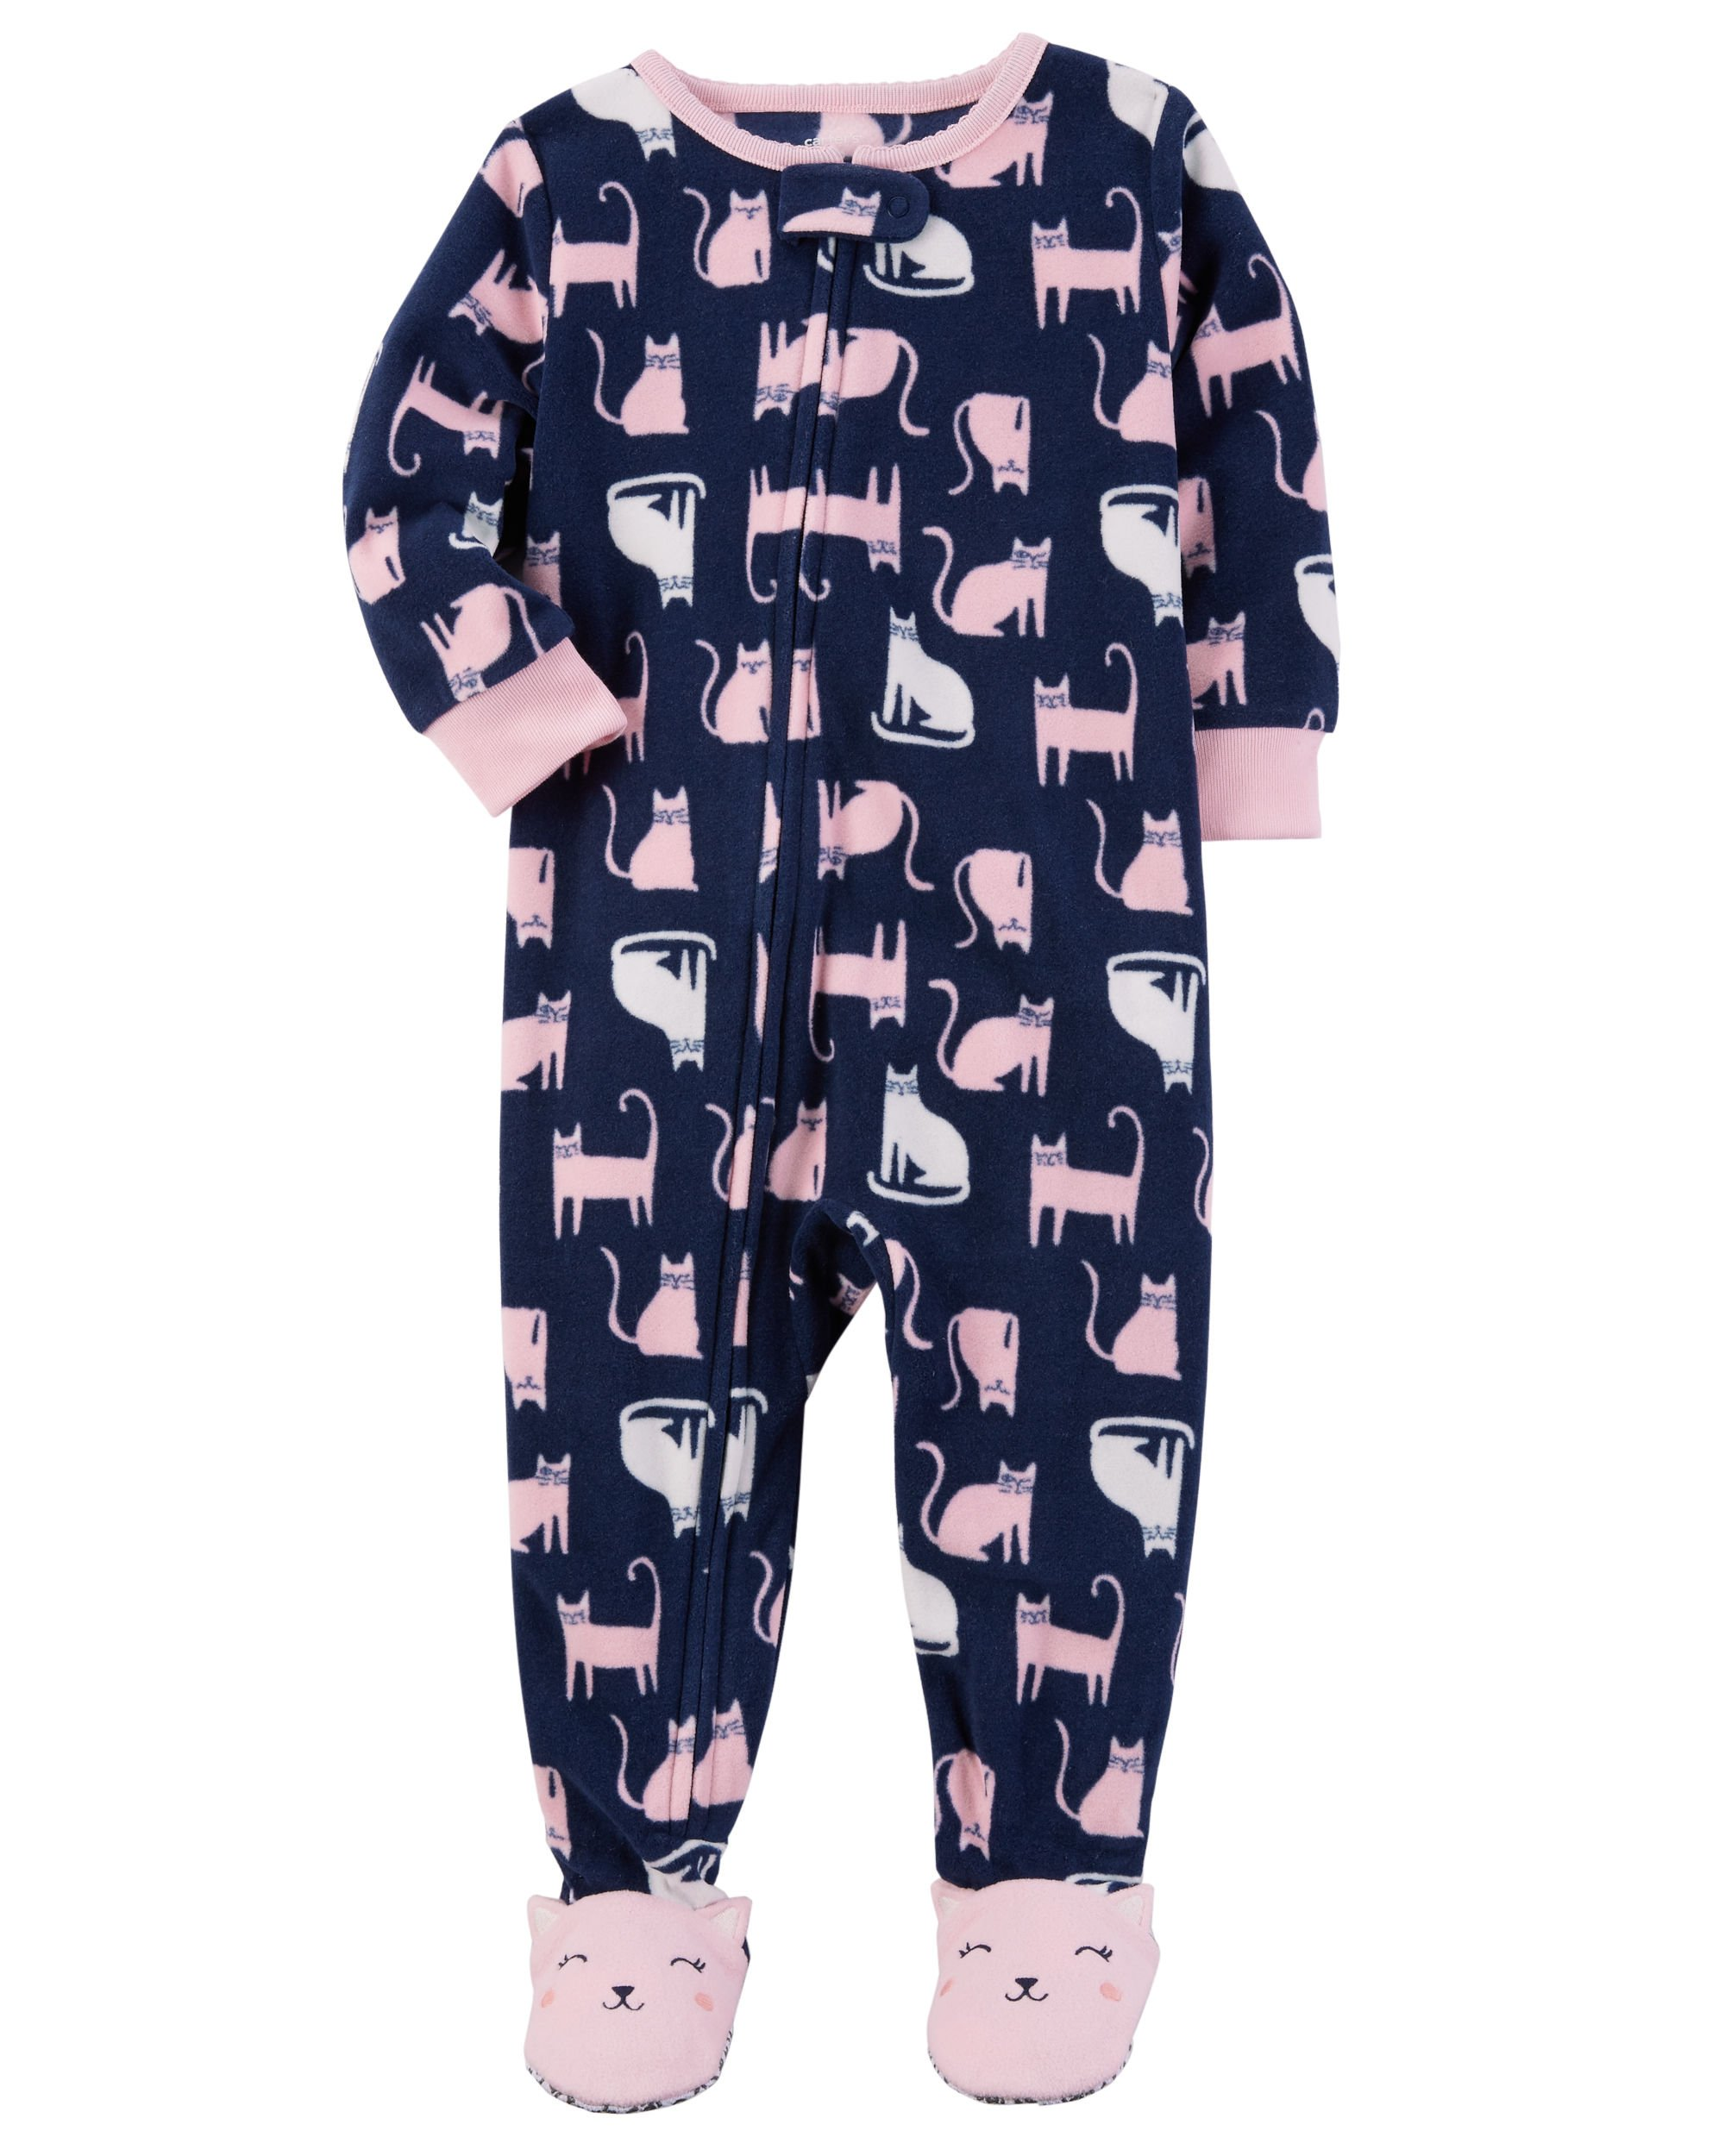 17a1c767261d Galleon - Carter s Girls Fleece Sleeper Pajamas (8